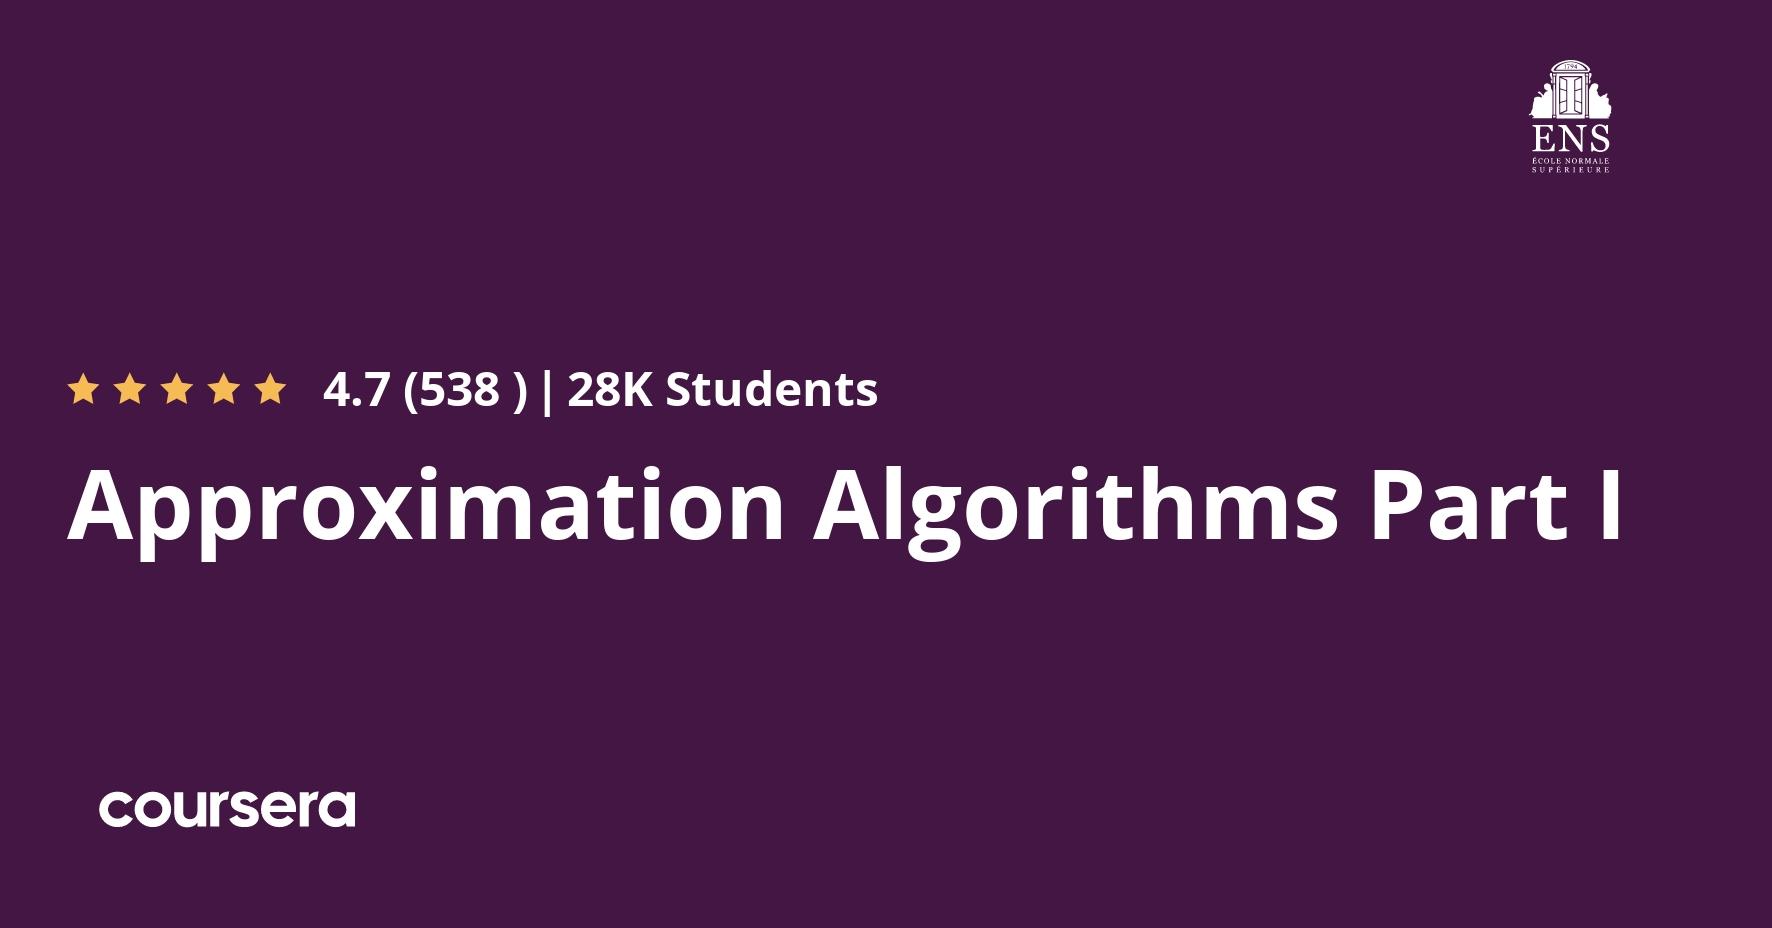 Algorithms, Part I (Coursera)